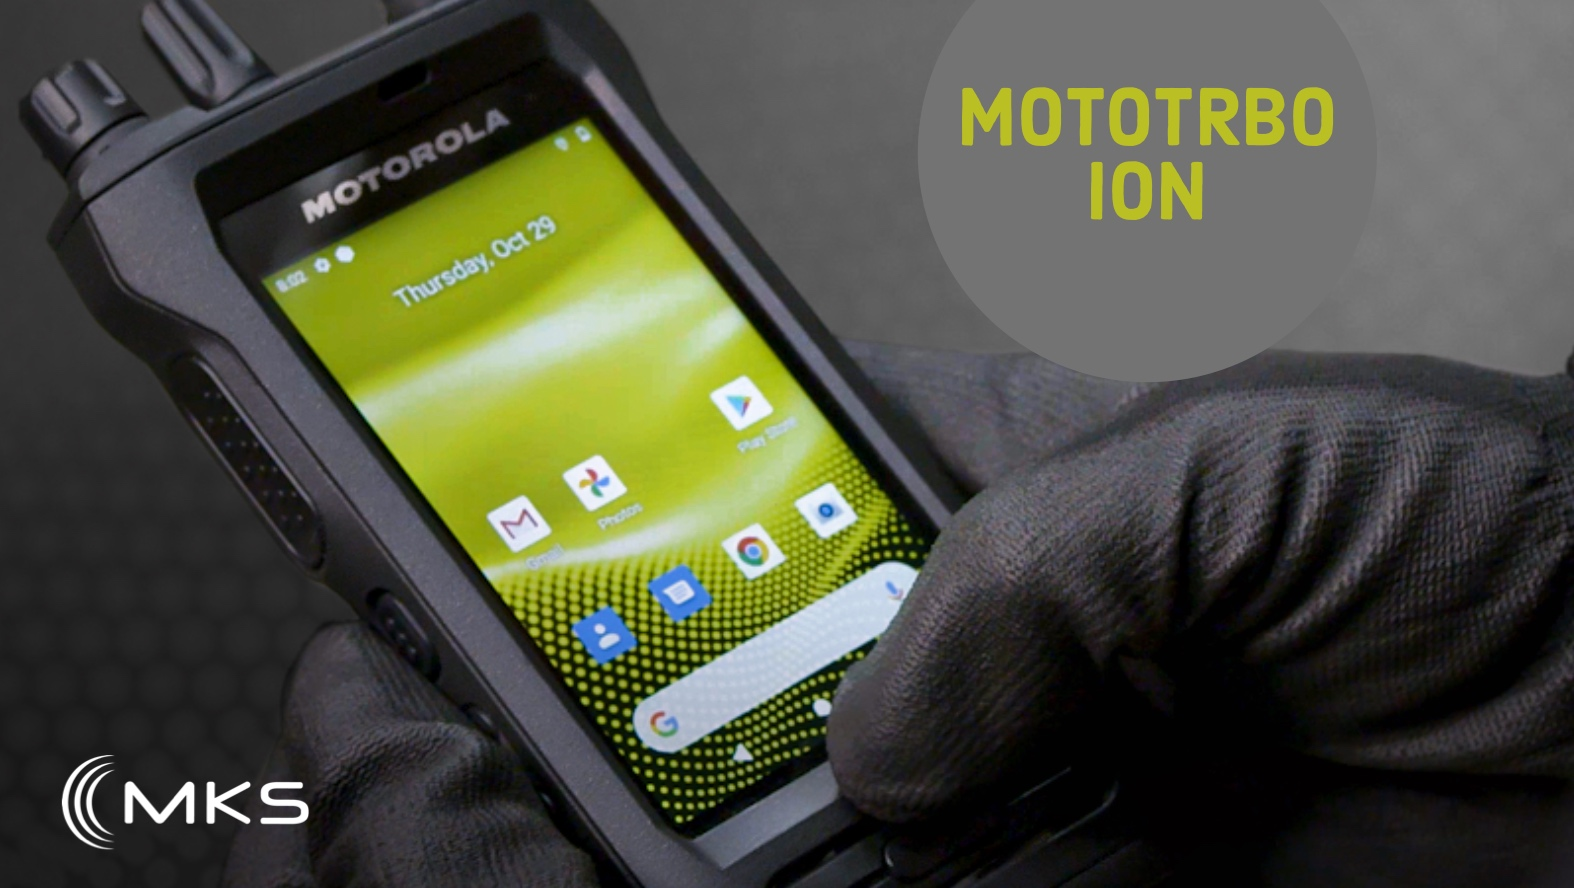 MOTOTRBO ION - MKS